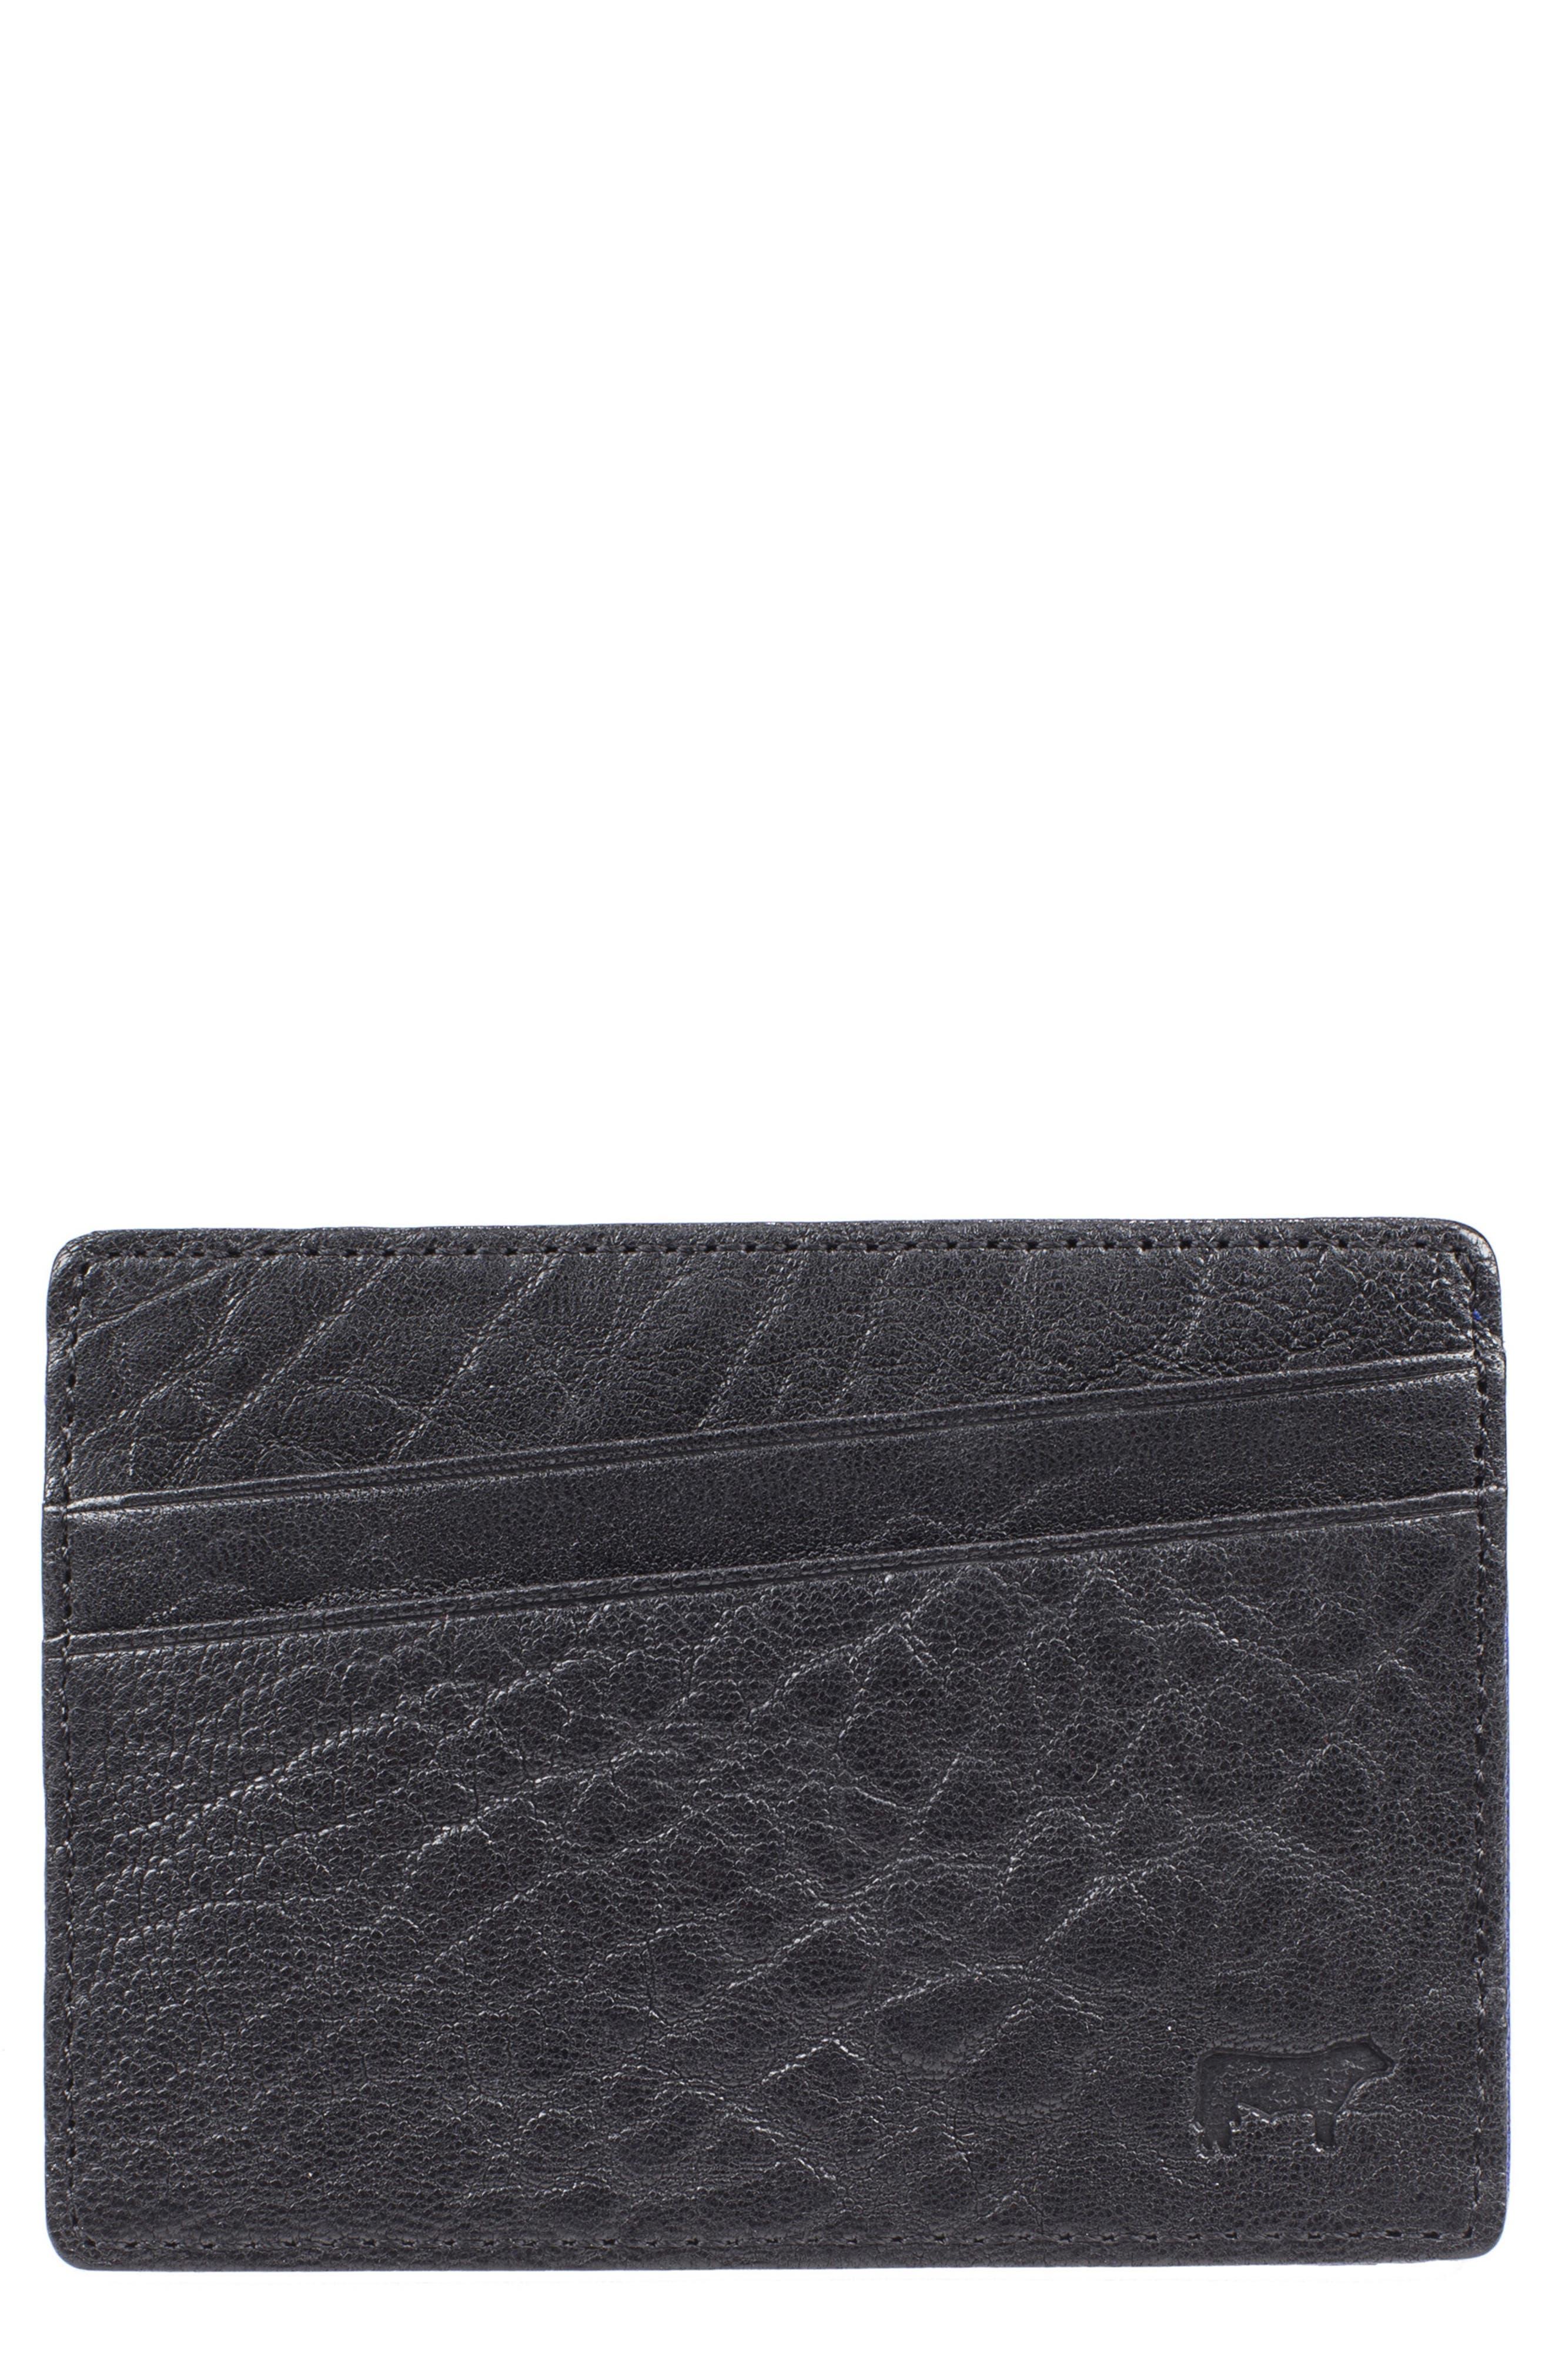 'Quip' Leather Card Case,                             Alternate thumbnail 3, color,                             012